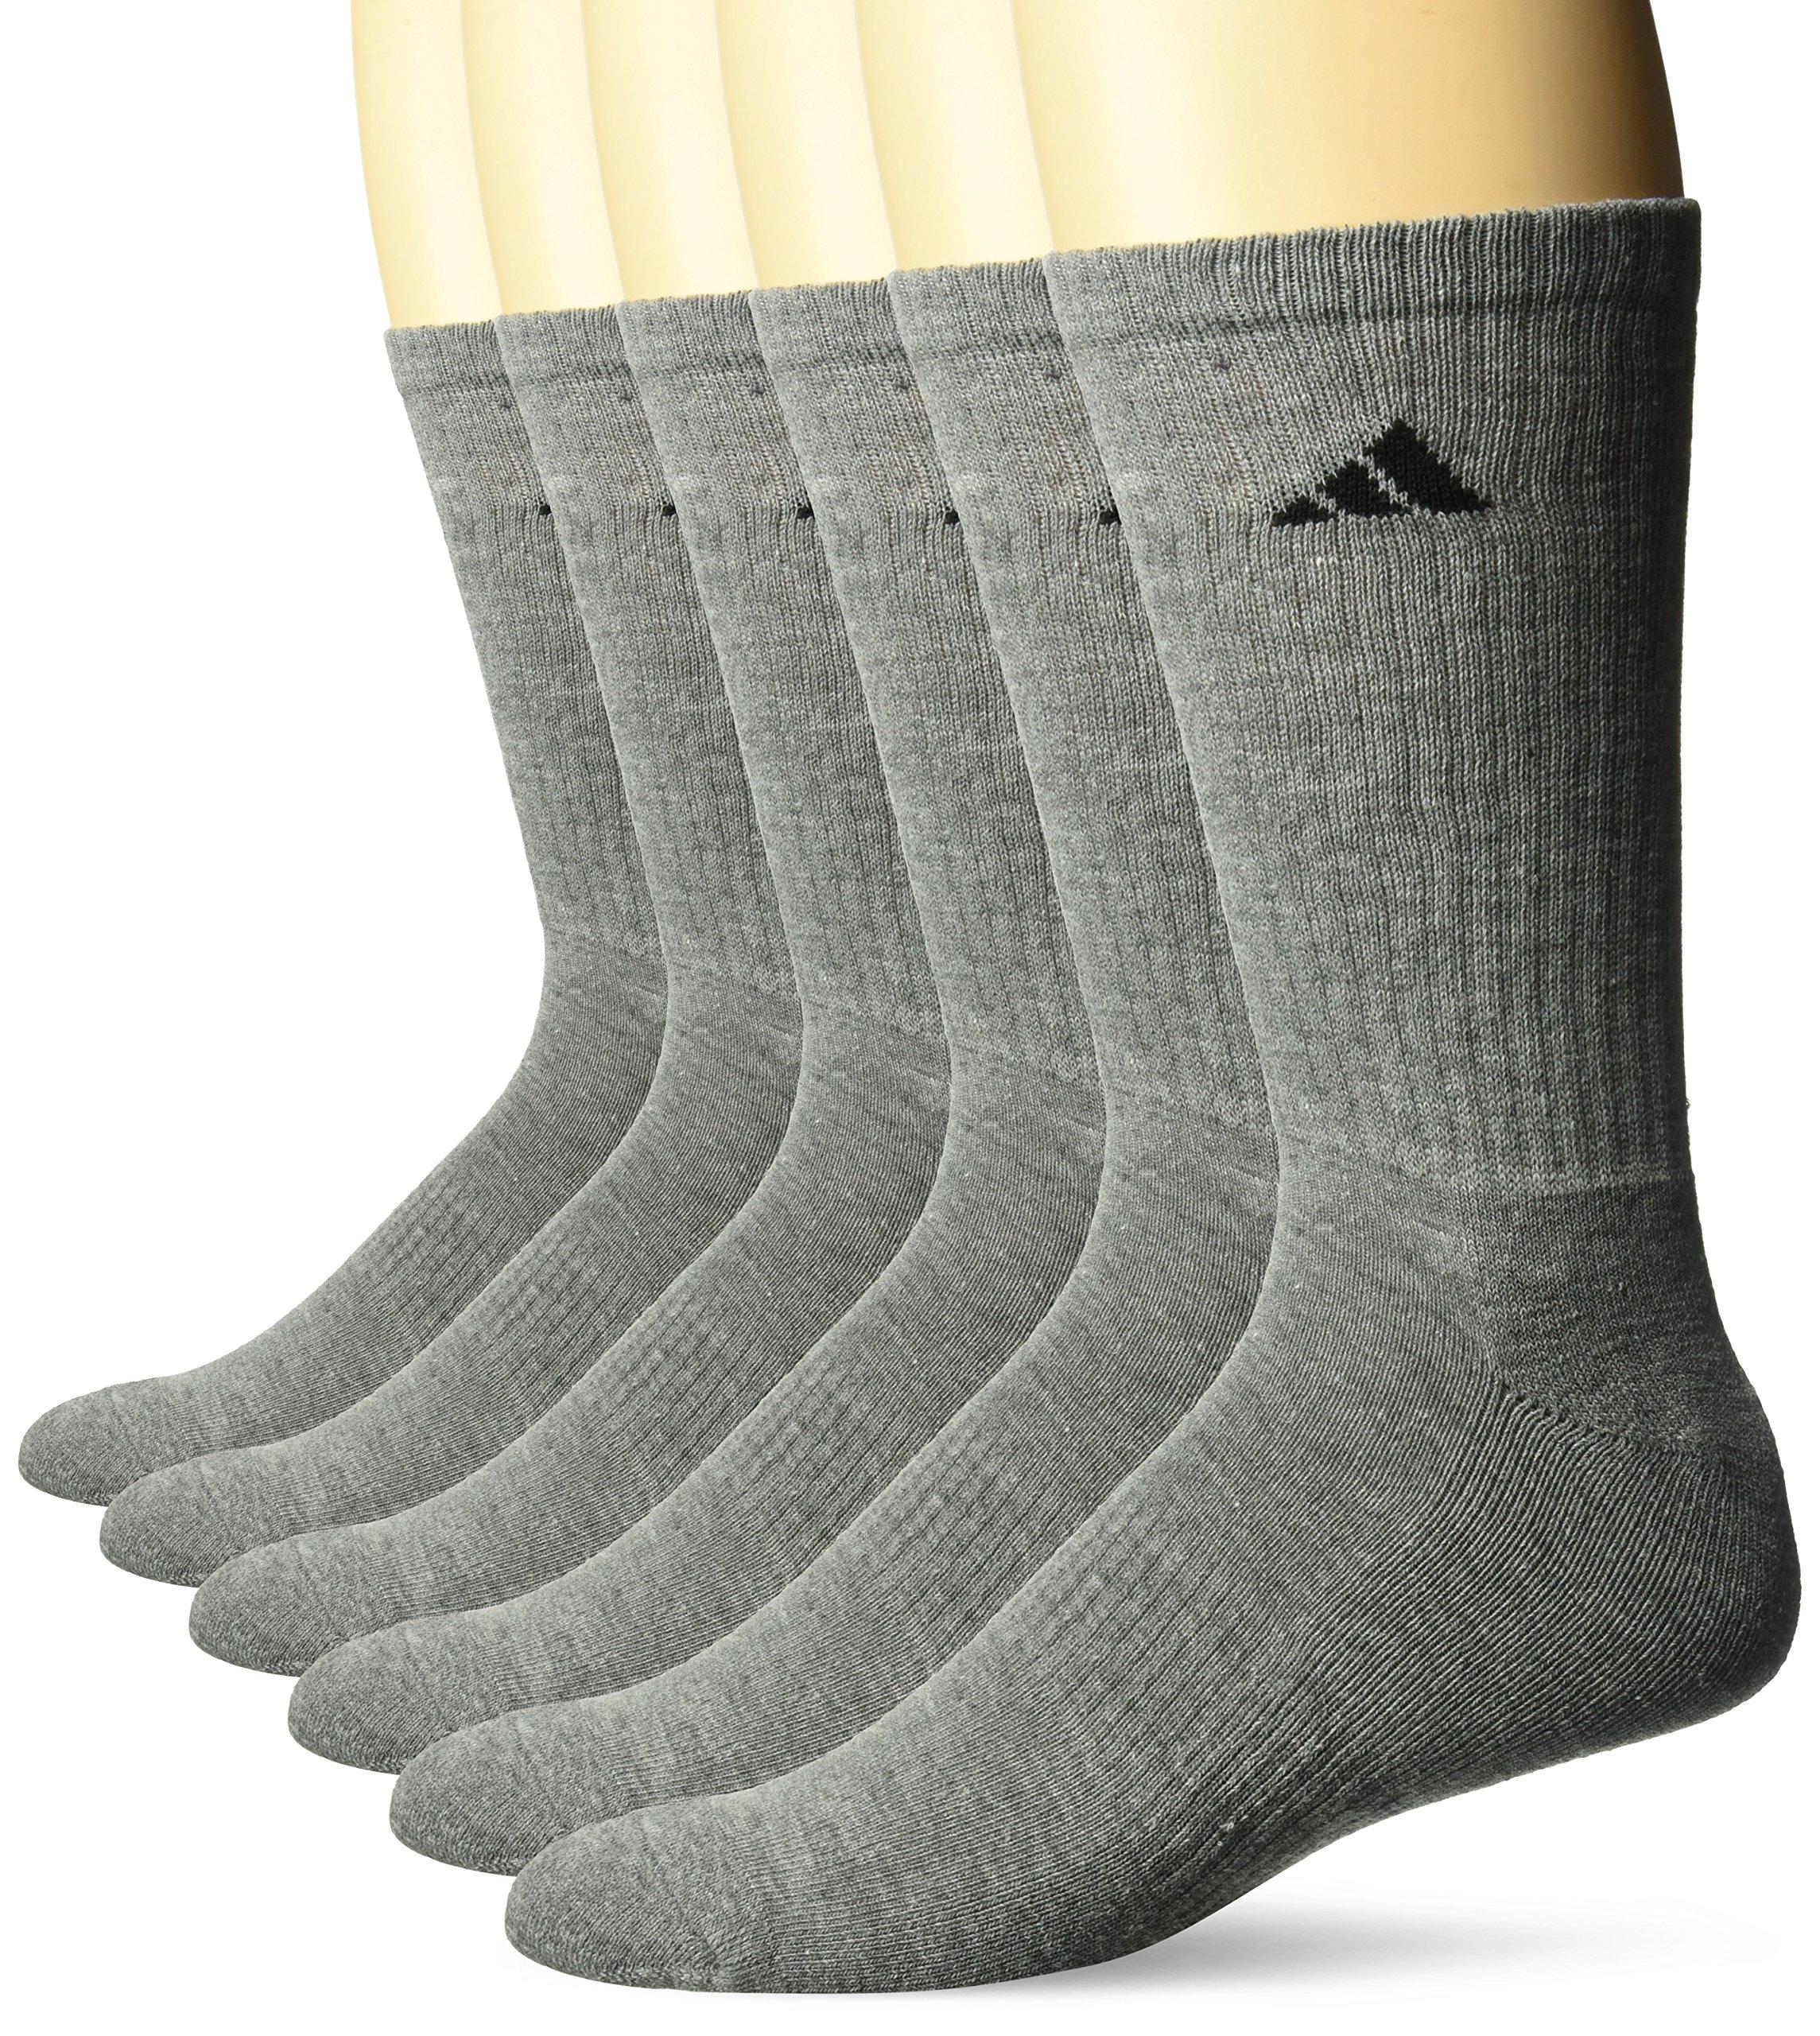 adidas Men's Athletic Cushioned Crew Socks (6-Pair), Heather Grey/Black, XL, (Shoe Size 12-16) by adidas